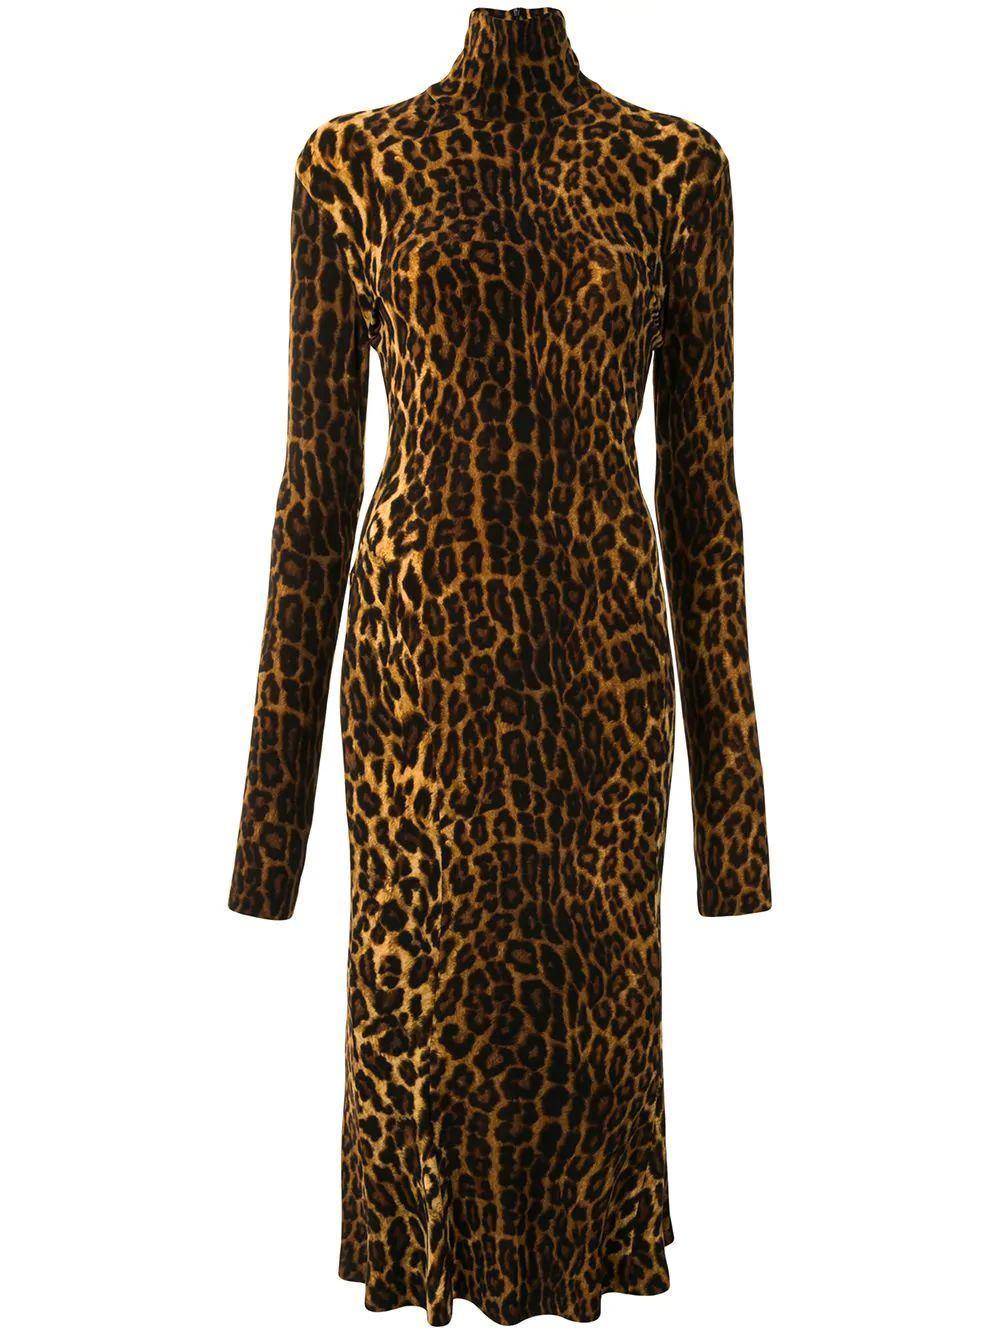 Leopard Turtleneck Dress